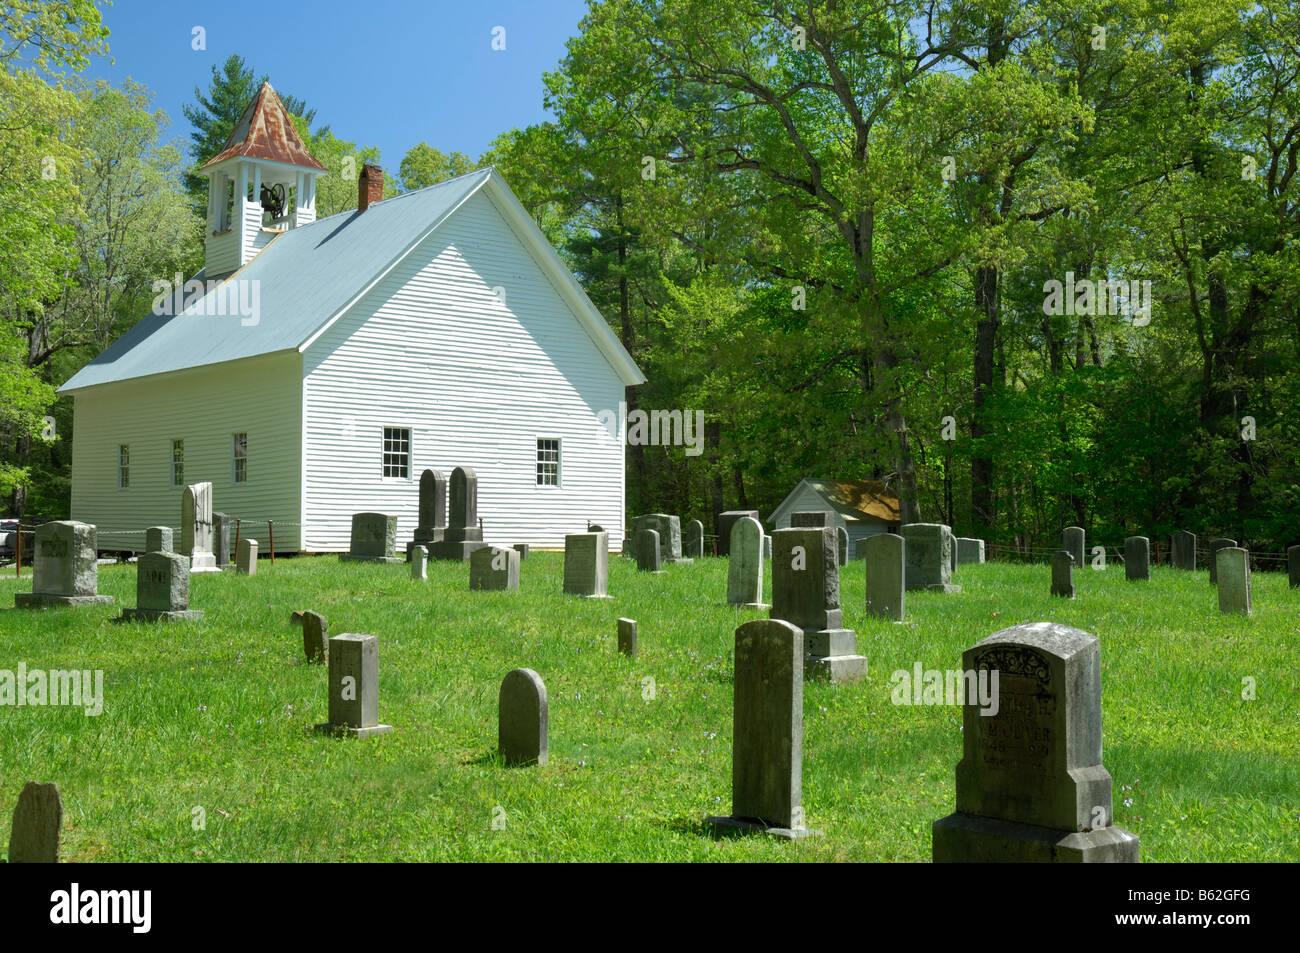 Primitive Baptist Church Stock Photos & Primitive Baptist Church ...